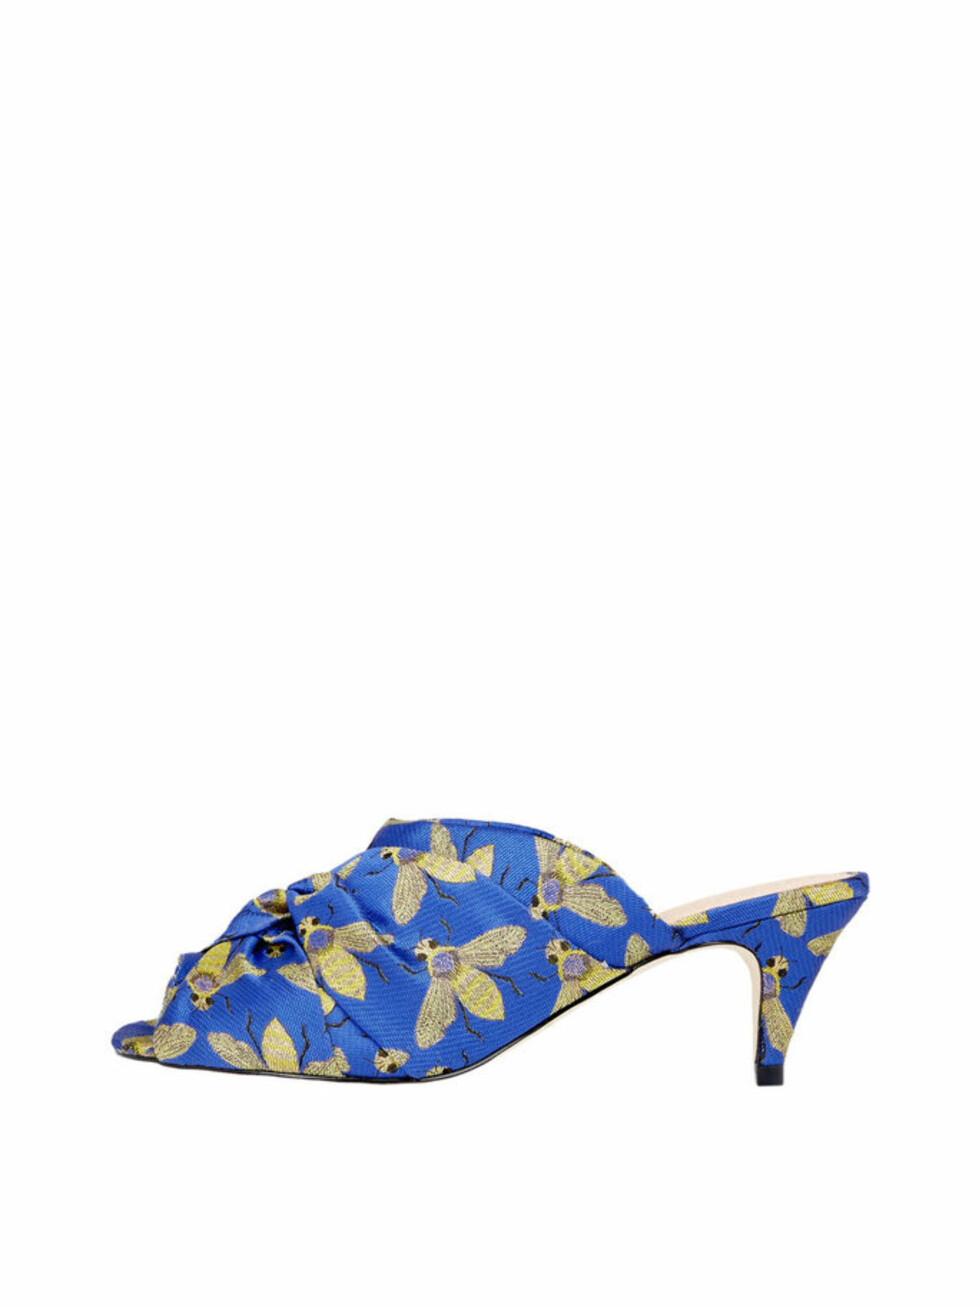 Sko fra Bianco  550,-  https://www.bianco.com/no/no/bi/damesko/sandaler/sandaler-med-hael/kitten-heel-mules-93549721.html?cgid=bi-women-heeled-sandals&dwvar_colorPattern=93549721_Blue